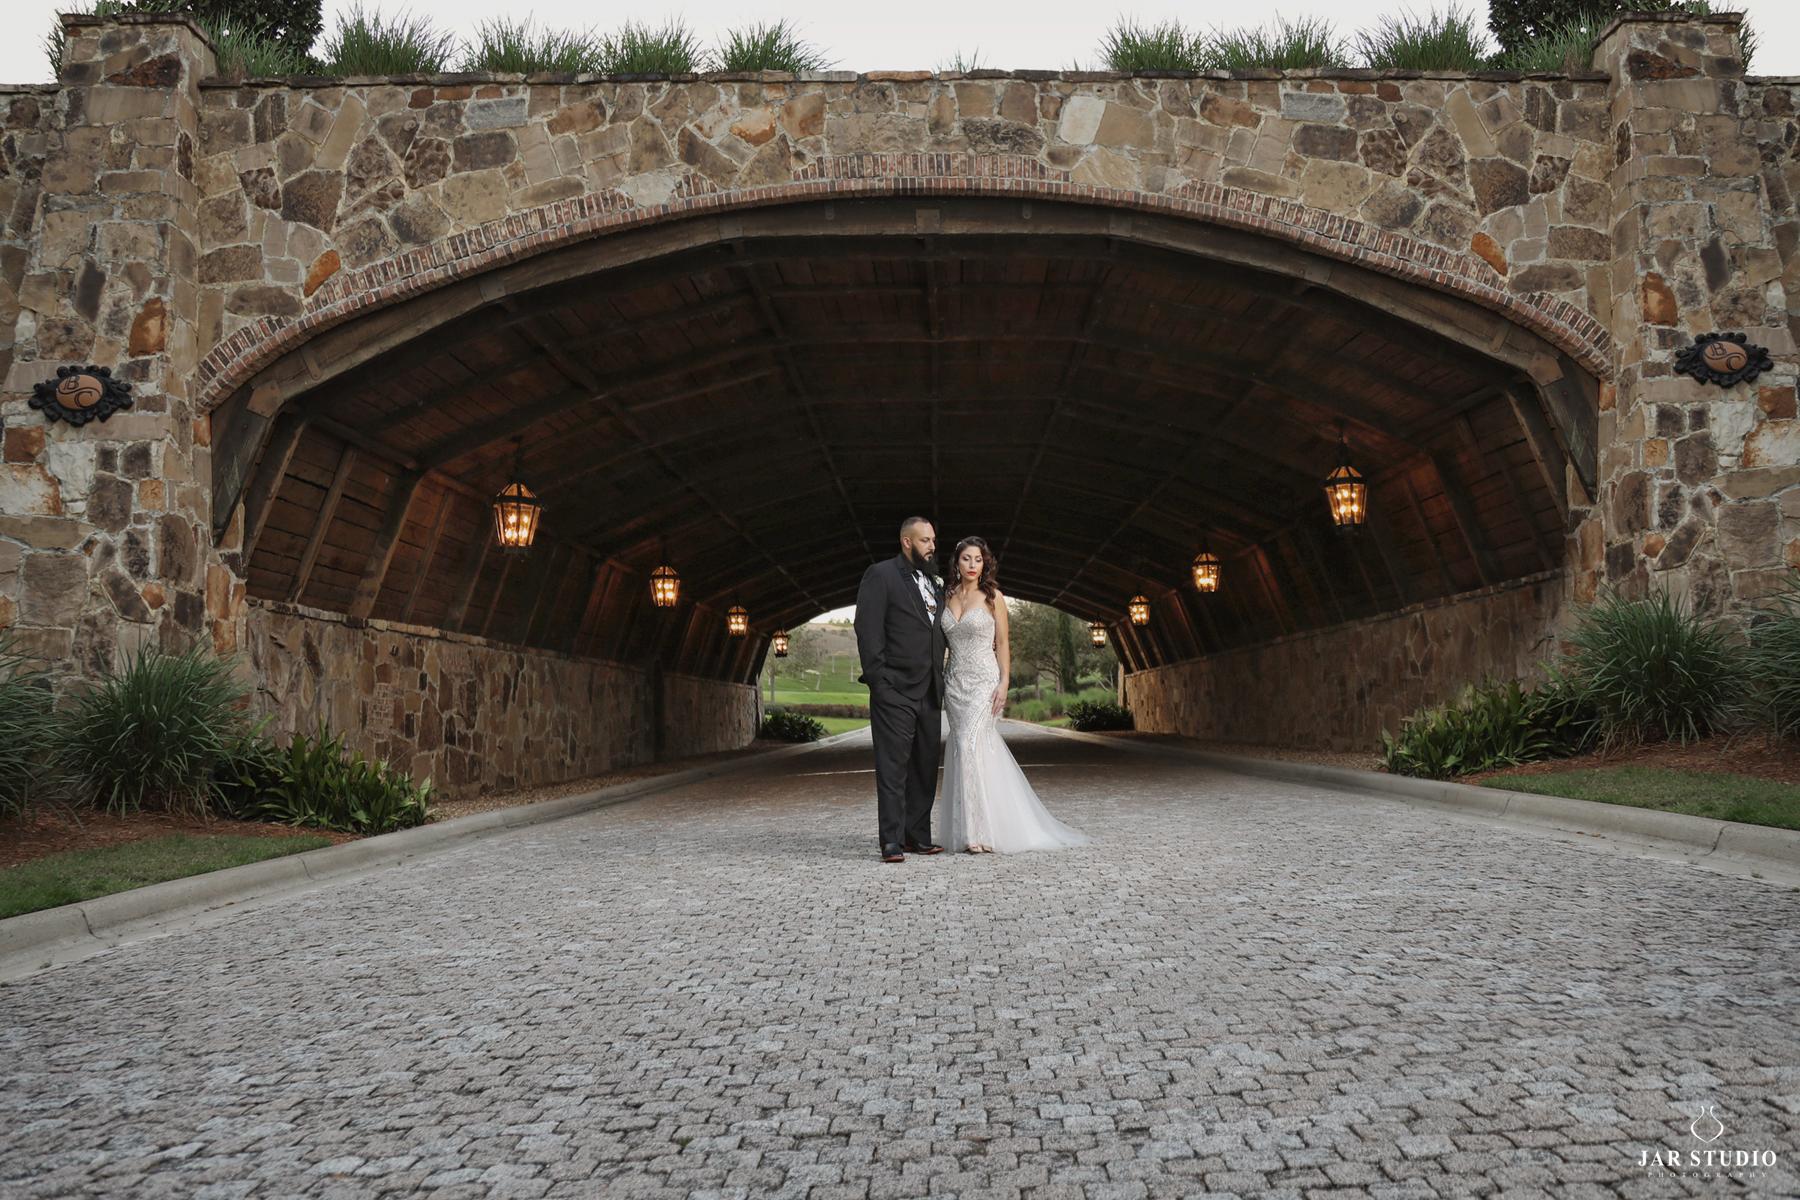 20-bella-collina-bridge-real-day-wedding-jarstudio.jpg